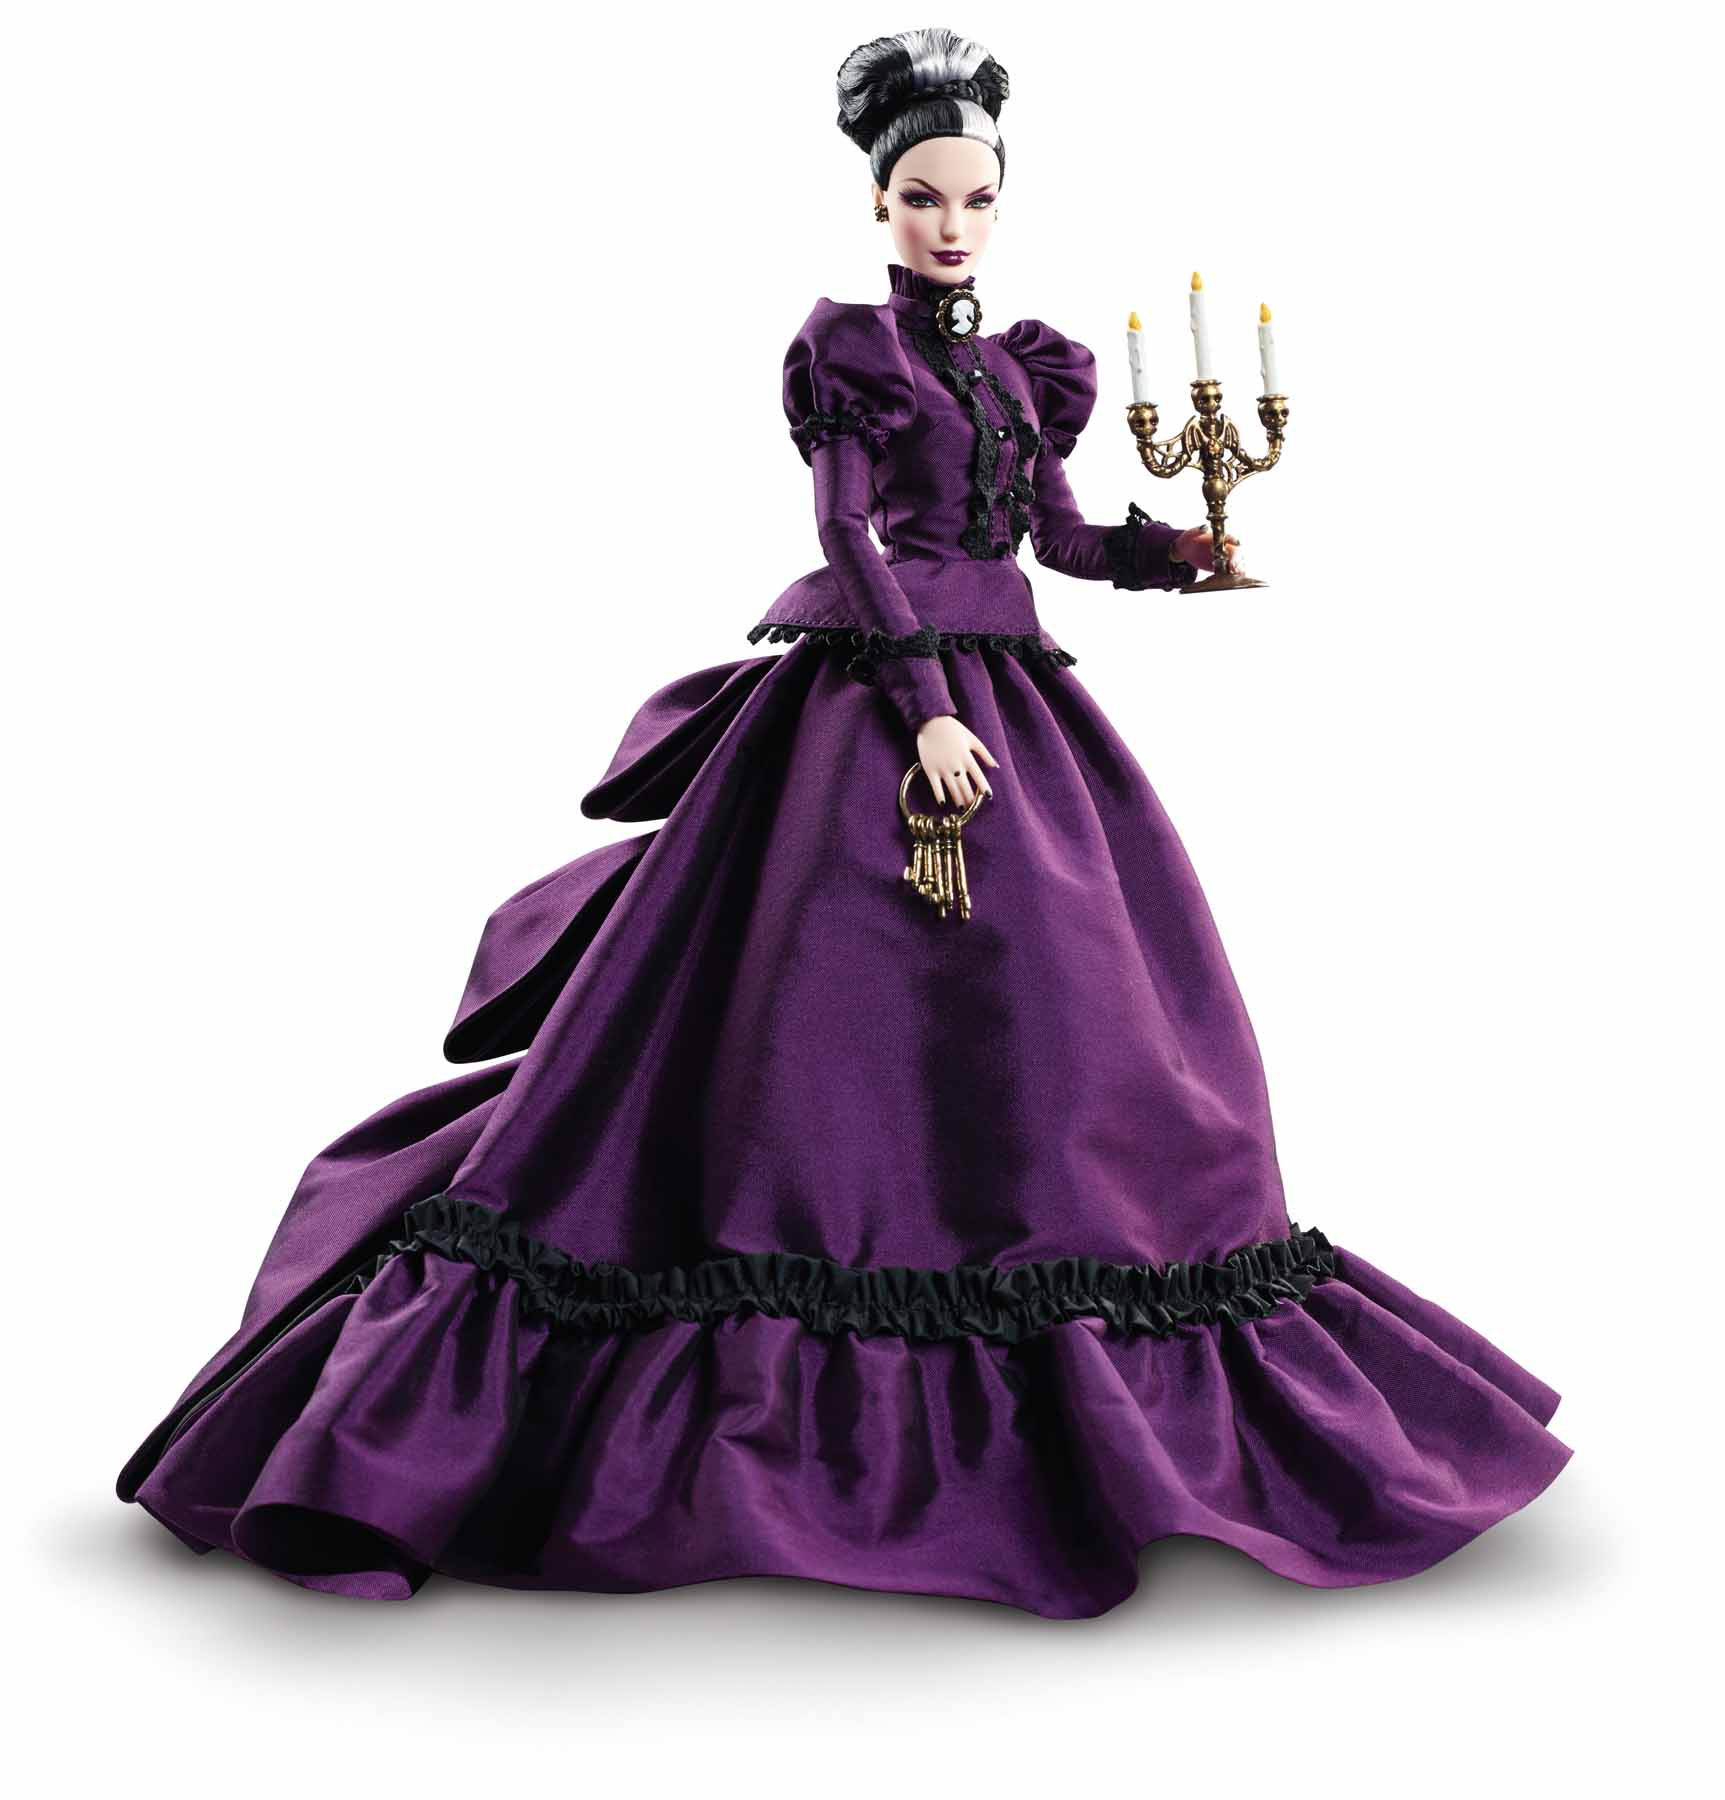 Mistress barbie